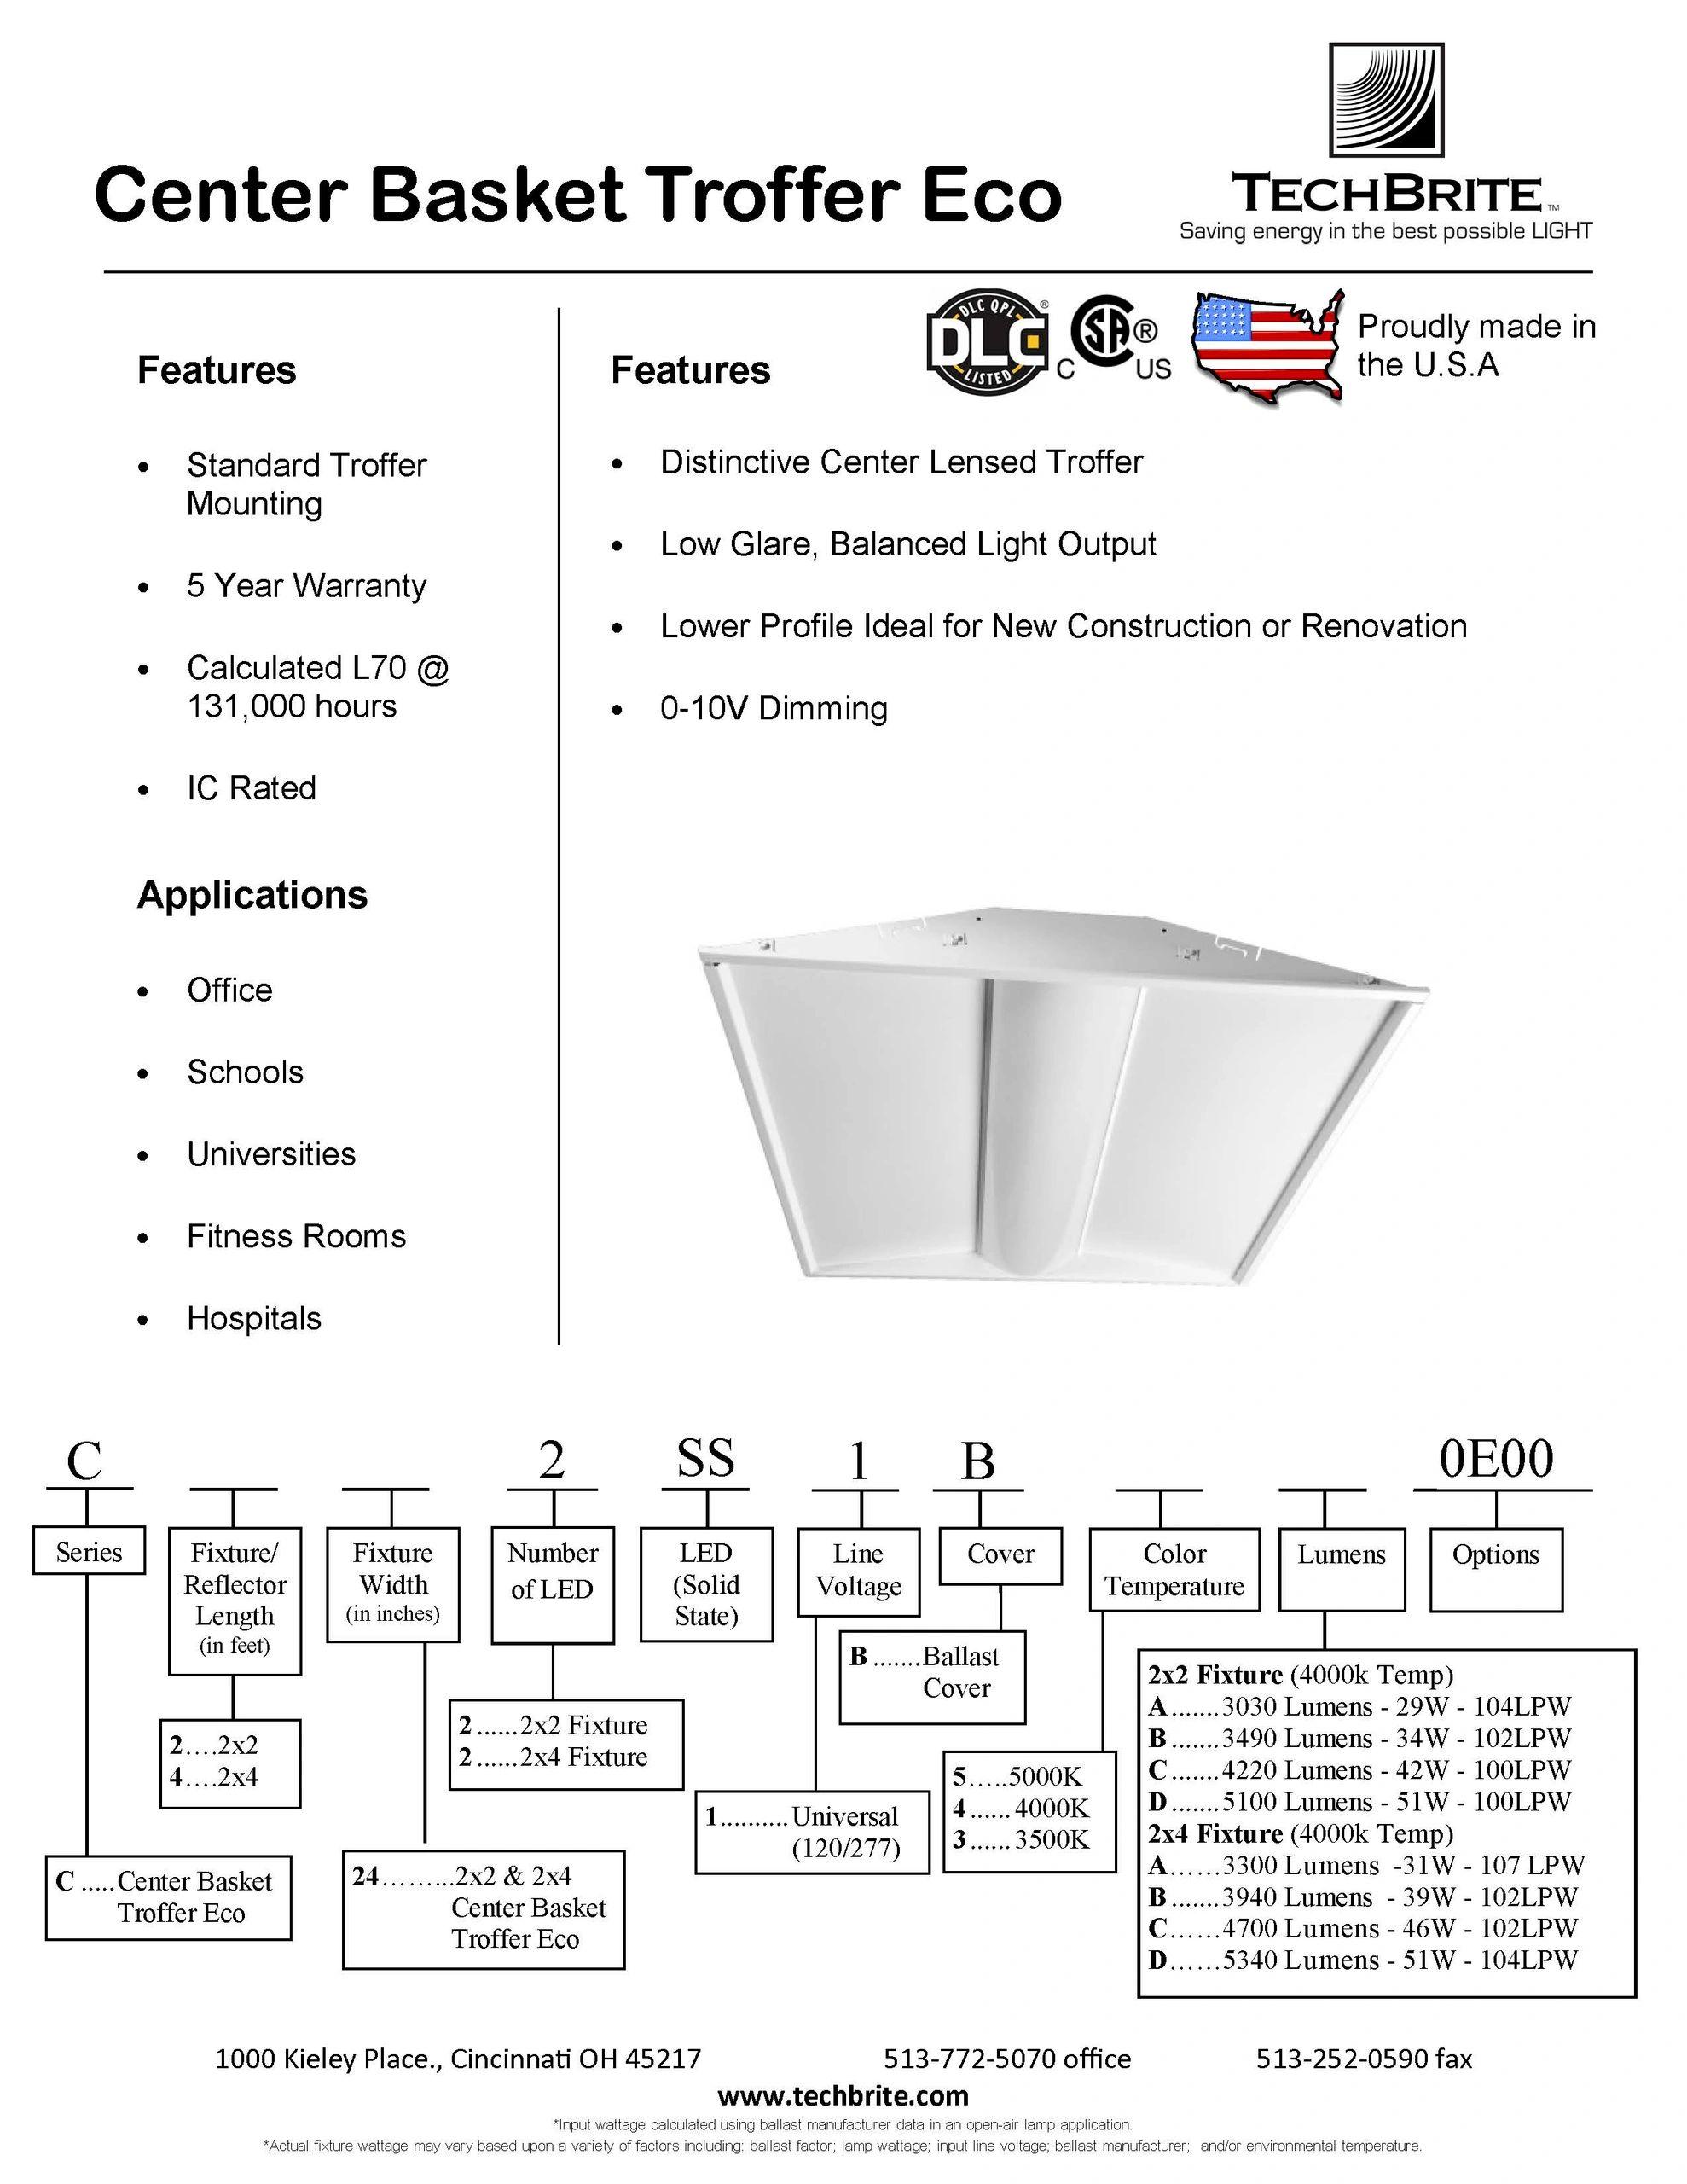 Retrofit 2x2 Optilumen Dimmable Wiring Diagram Free Download Oasis 0 10v Dimming Led Troffer Kit 2x4 Recessed